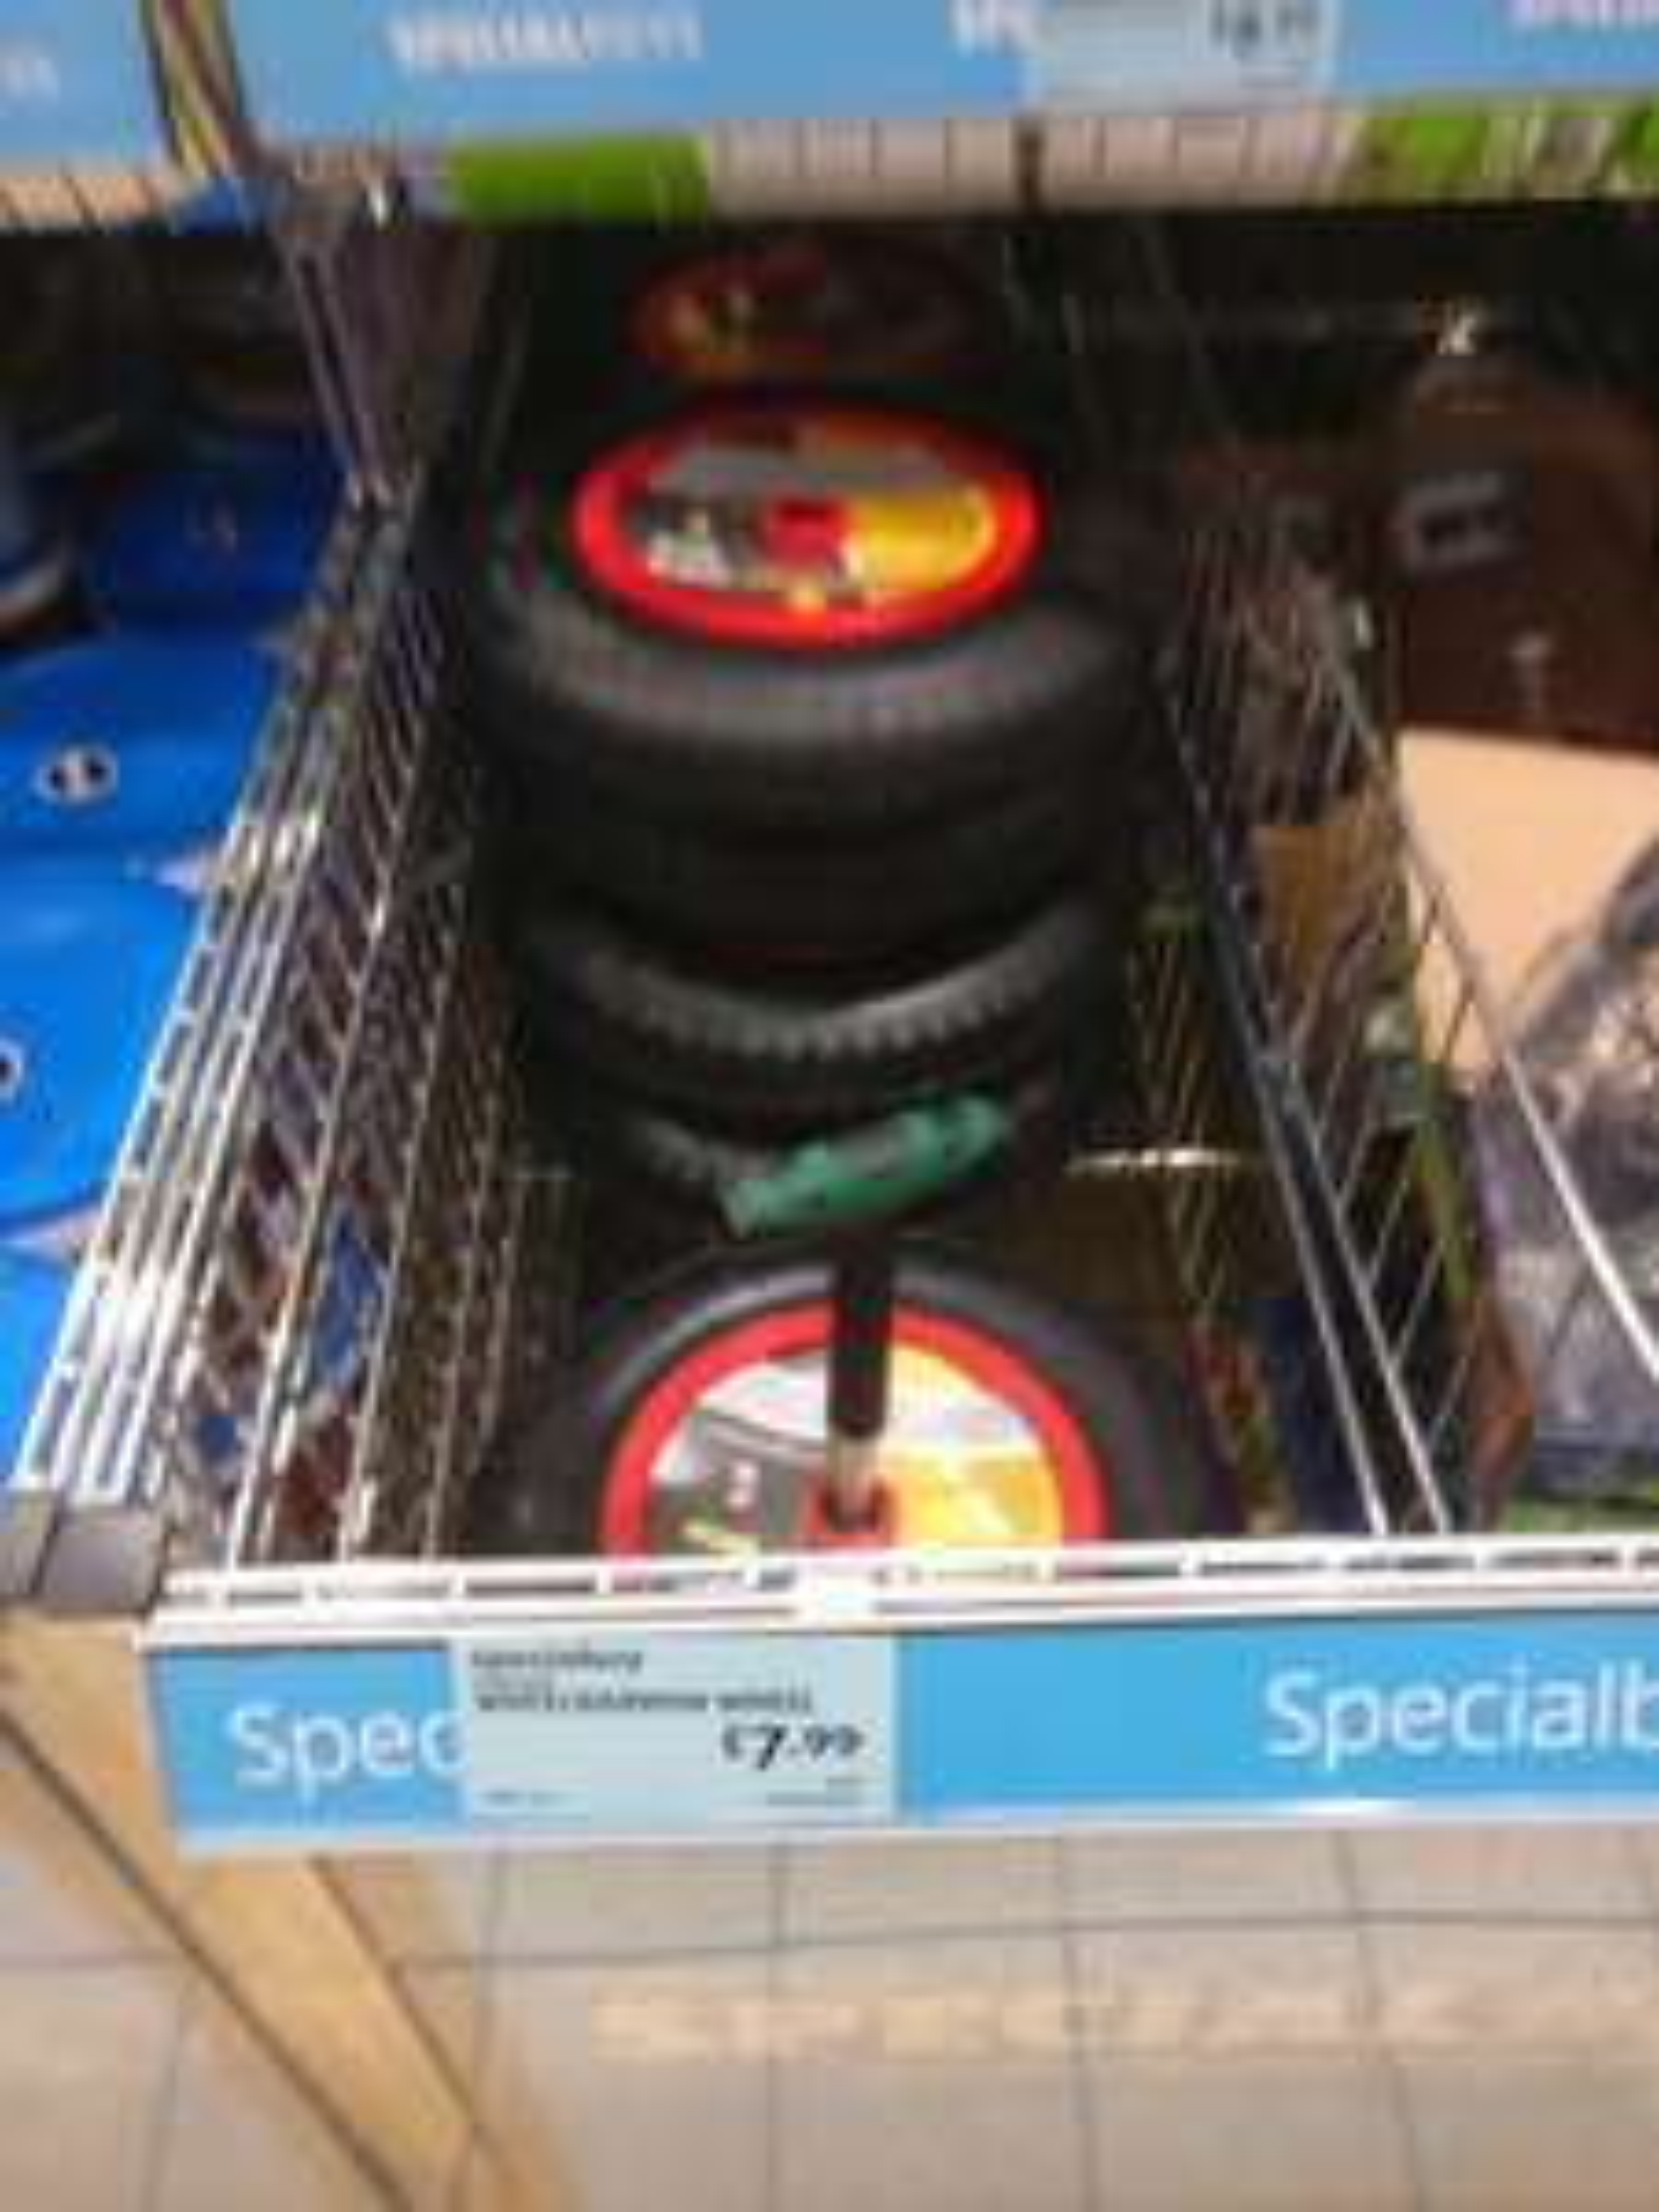 Wheelbarrow Wheels @ ALDI instore for £7.99